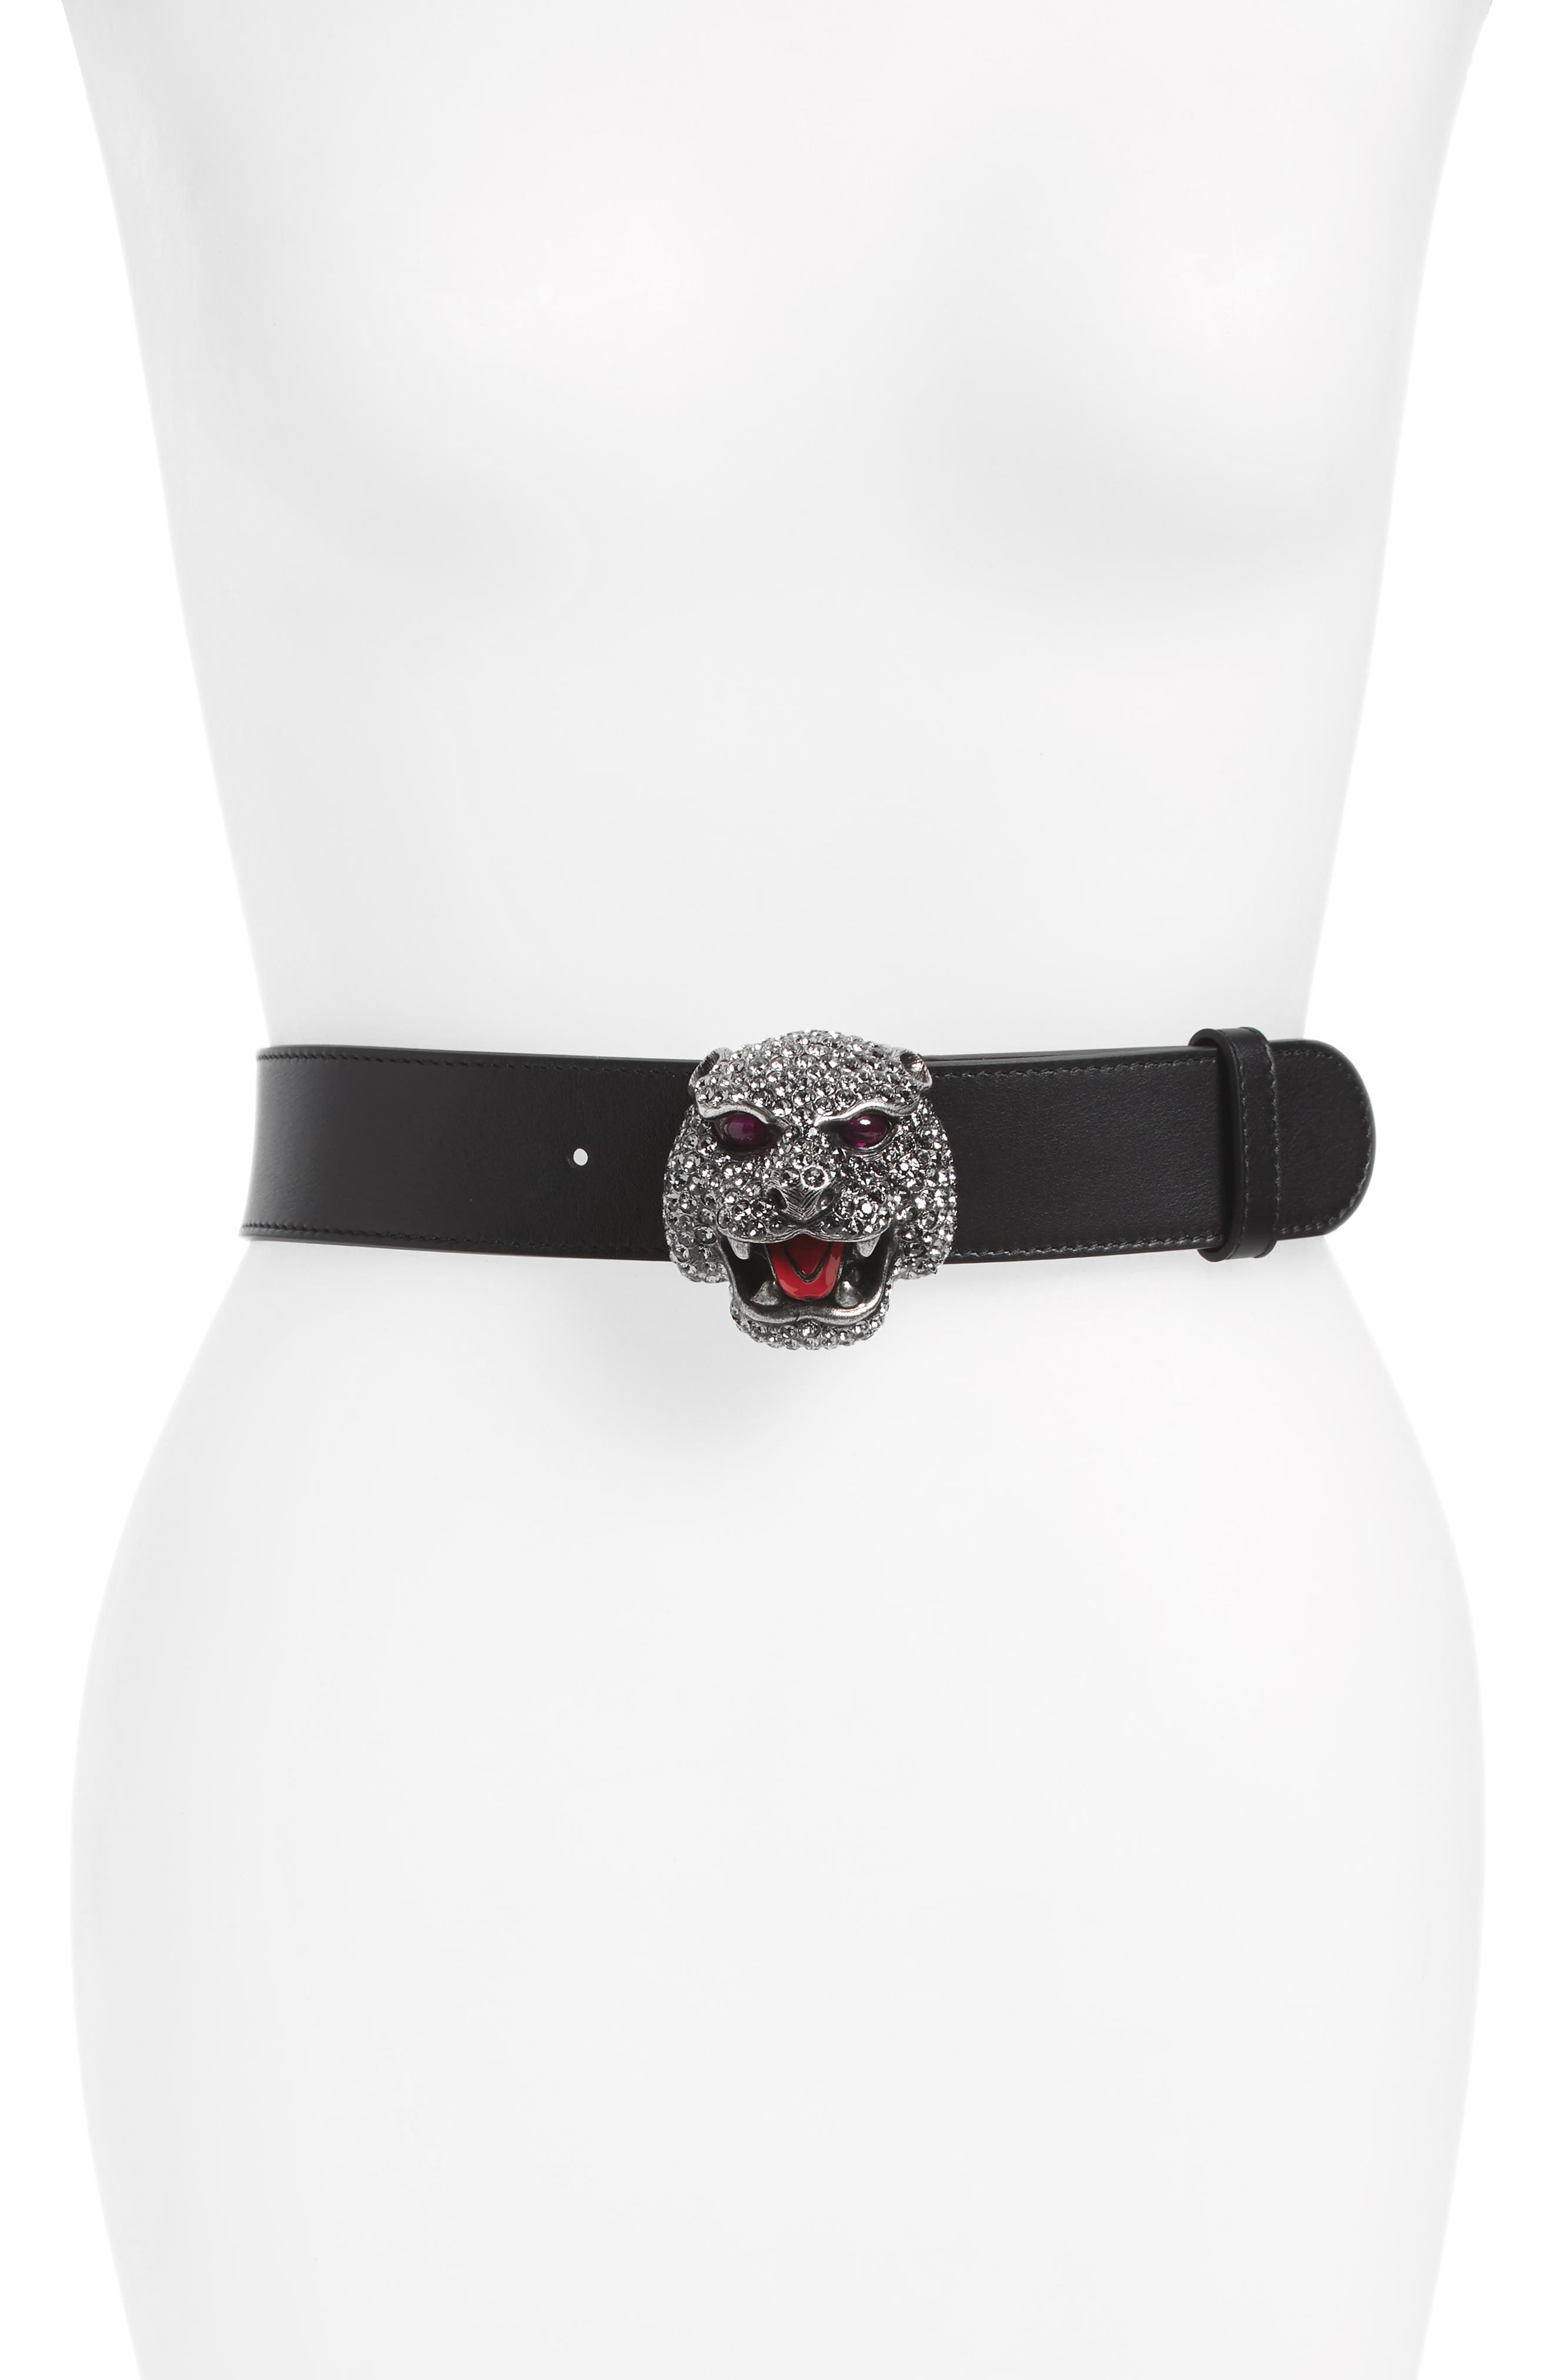 Alternate Image 1 Selected - Gucci Tiger Buckle Calfskin Leather Belt